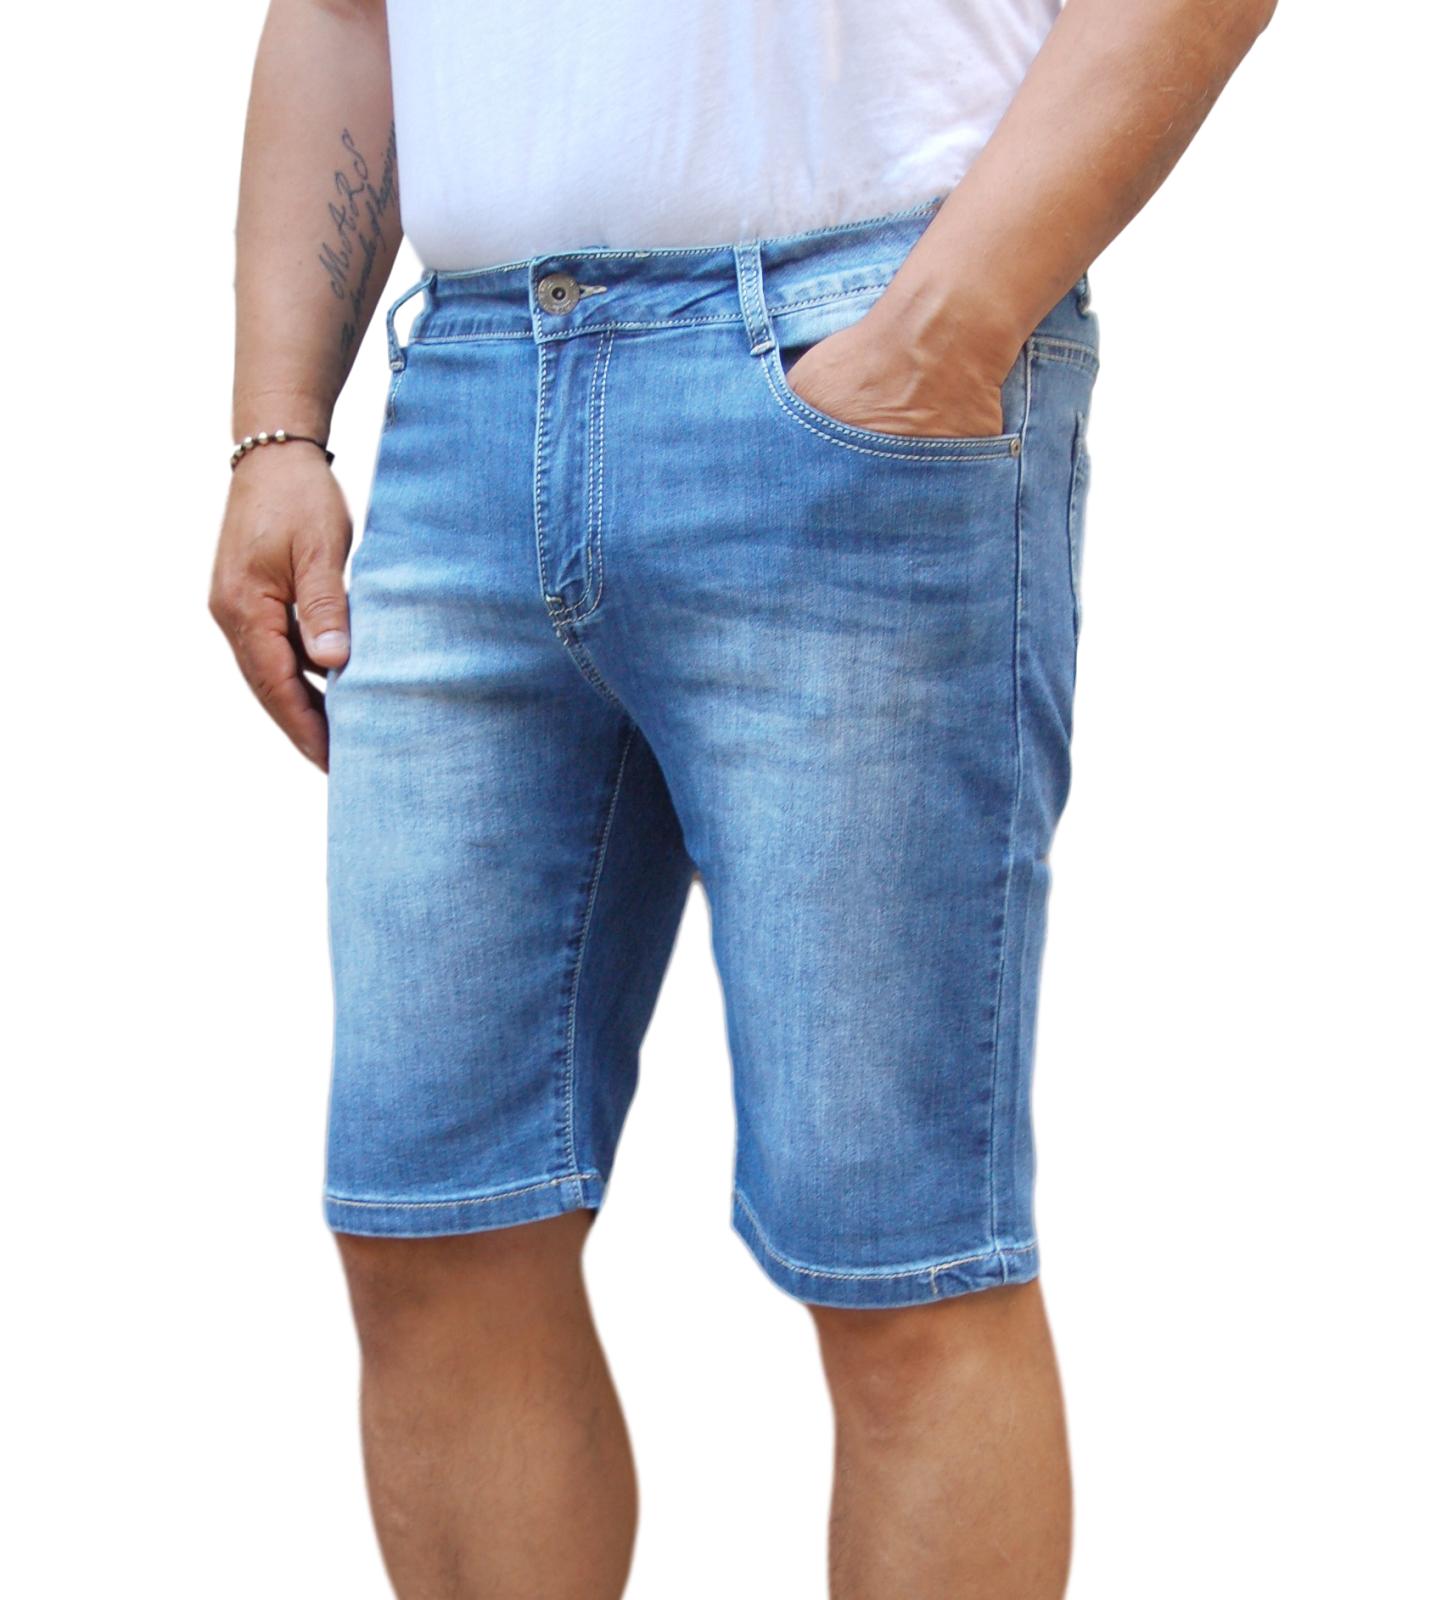 Jeans Pantalone Corto Pantaloncino Bermuda Shorts Uomo Denim Vita Bassa Scolorit